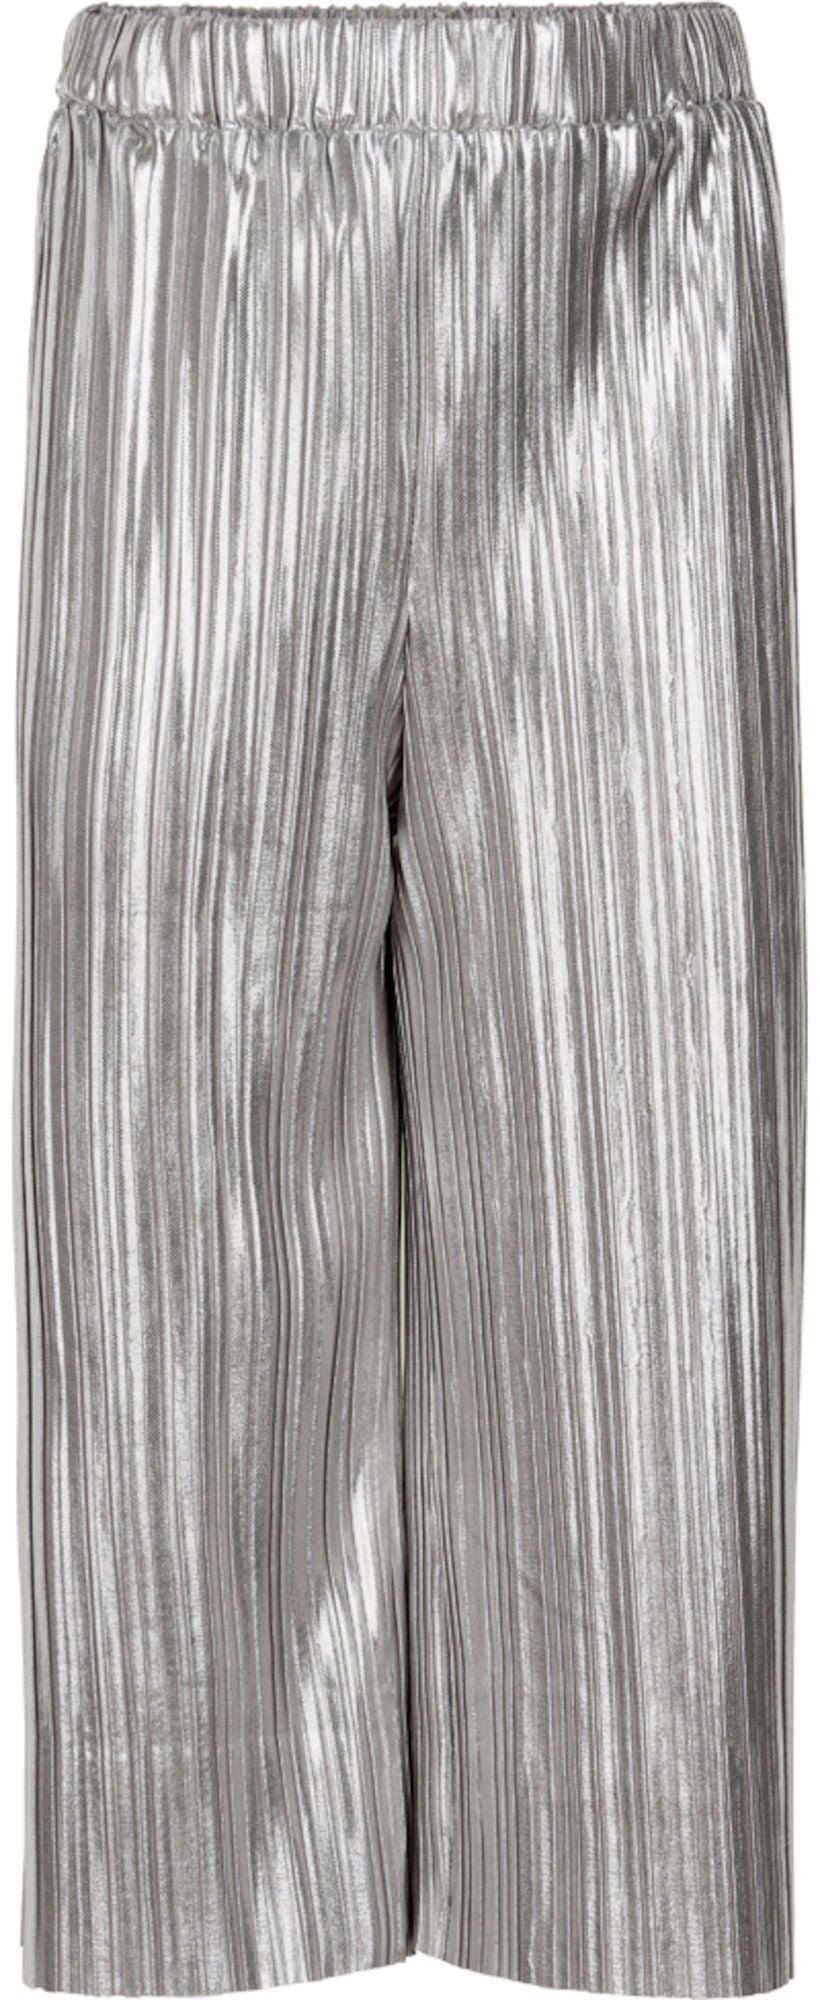 Kjøp Creamie Metallic Plissé Bluse, Silver   Jollyroom